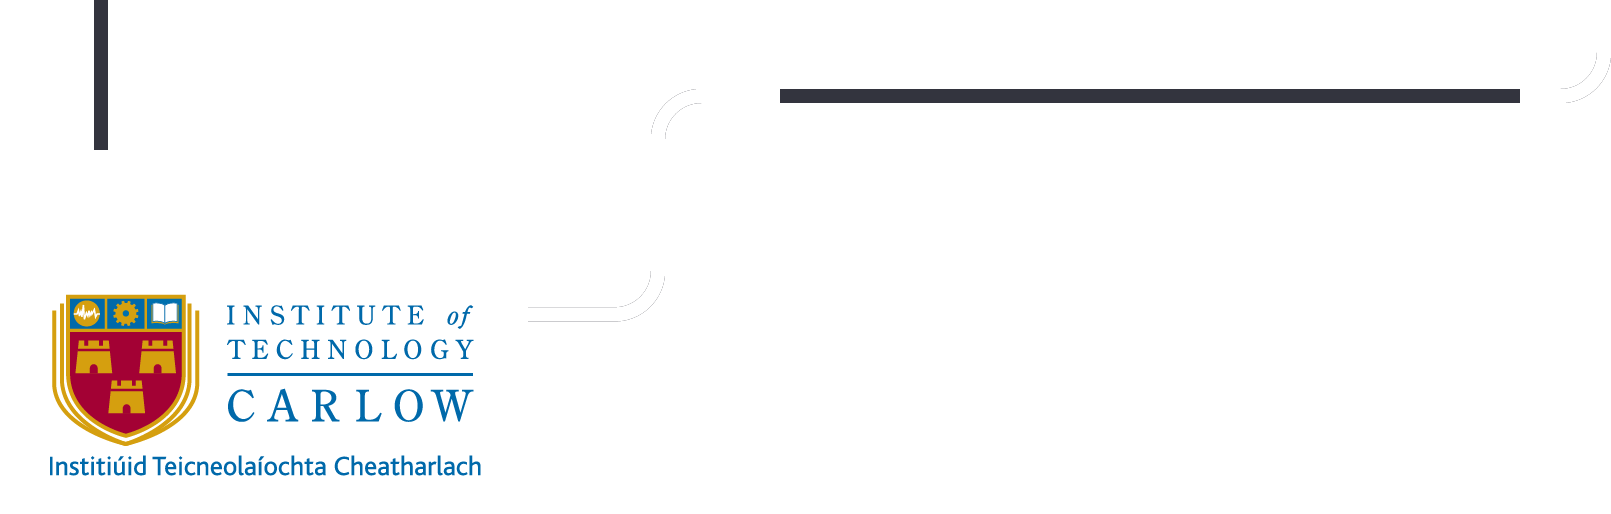 BUCANIER Carlow logo